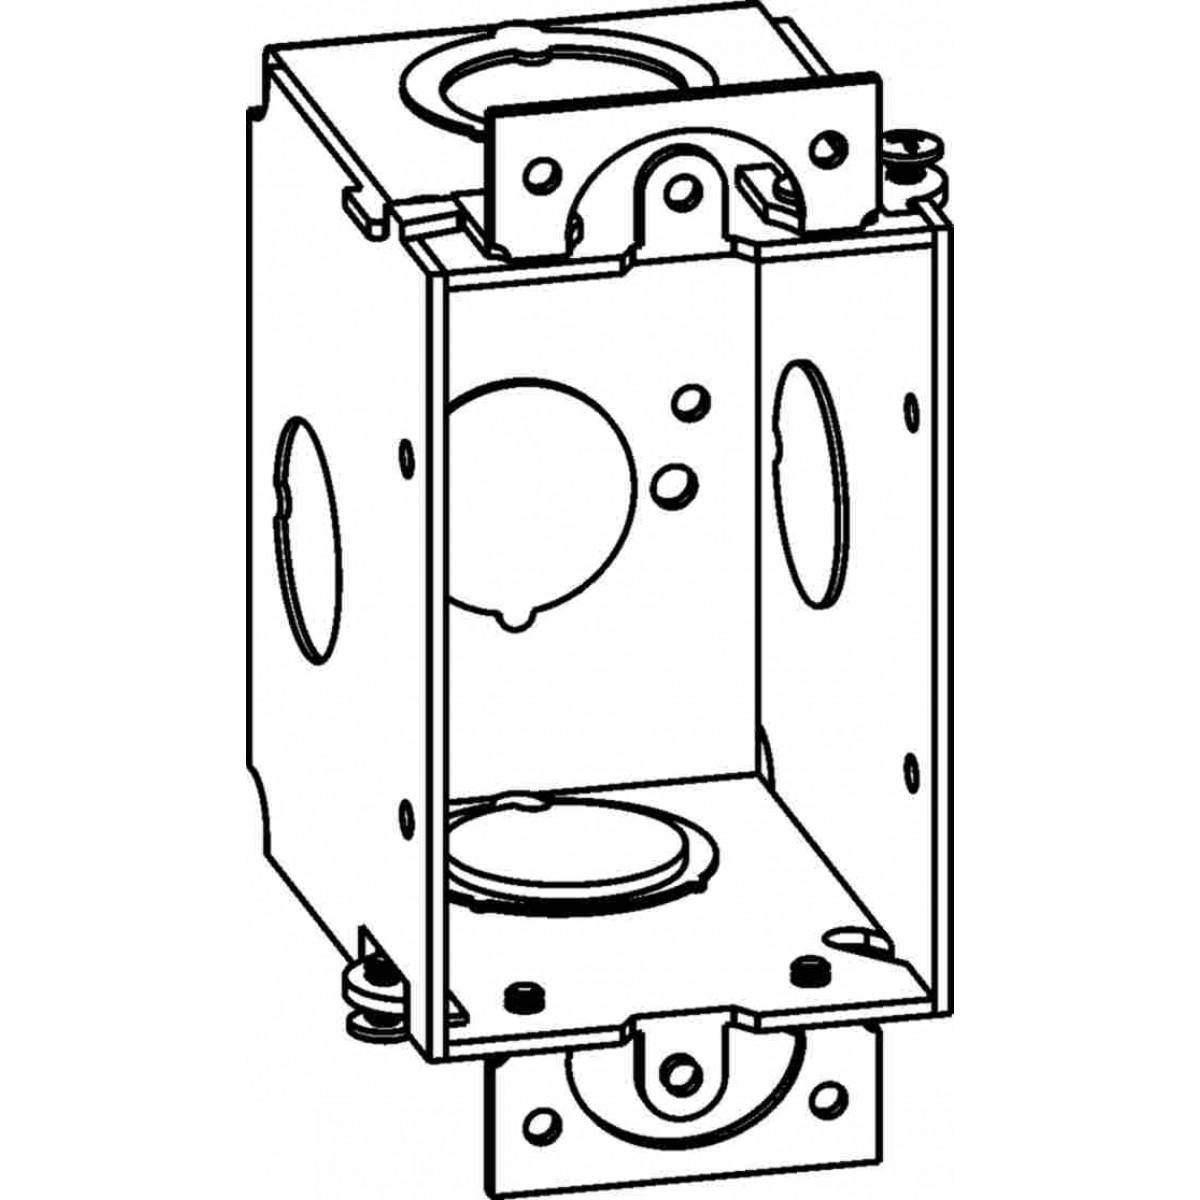 ballast wiring diagram as well advance 100 watt metal halide ballast